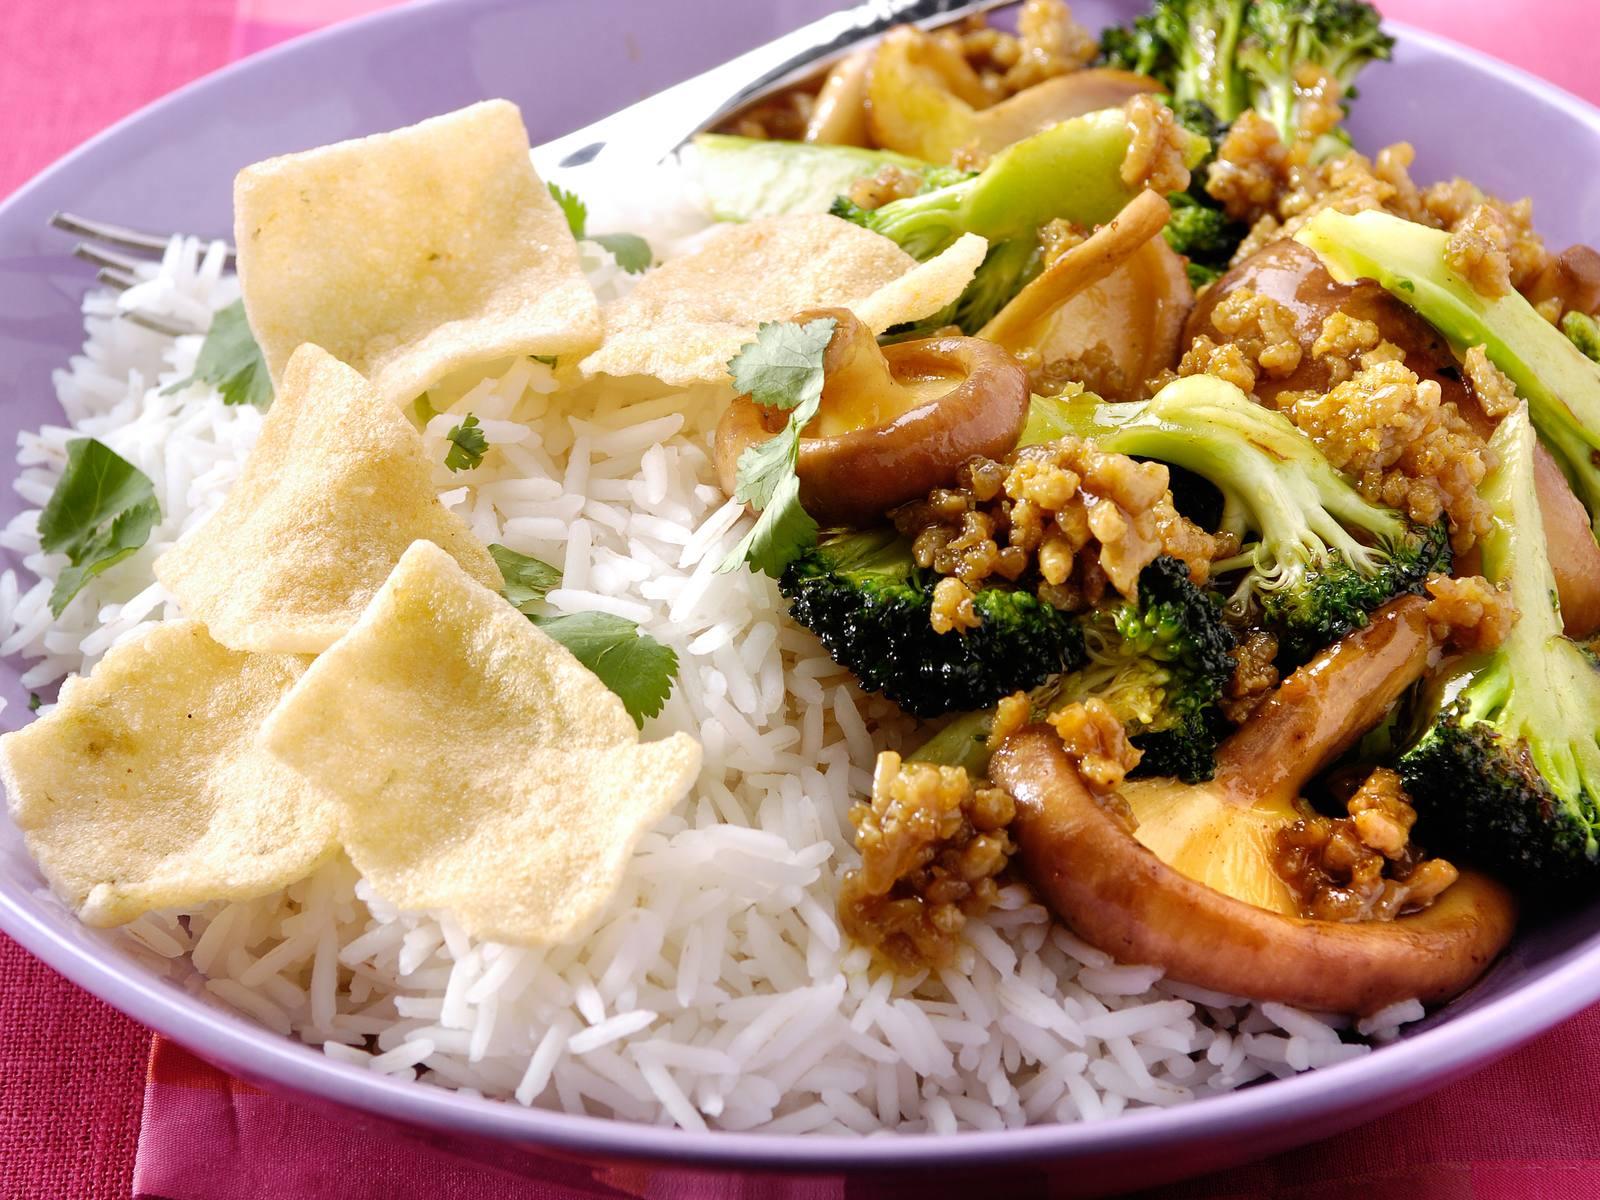 Gewokt Teriyakigehakt met broccoli en shii takes